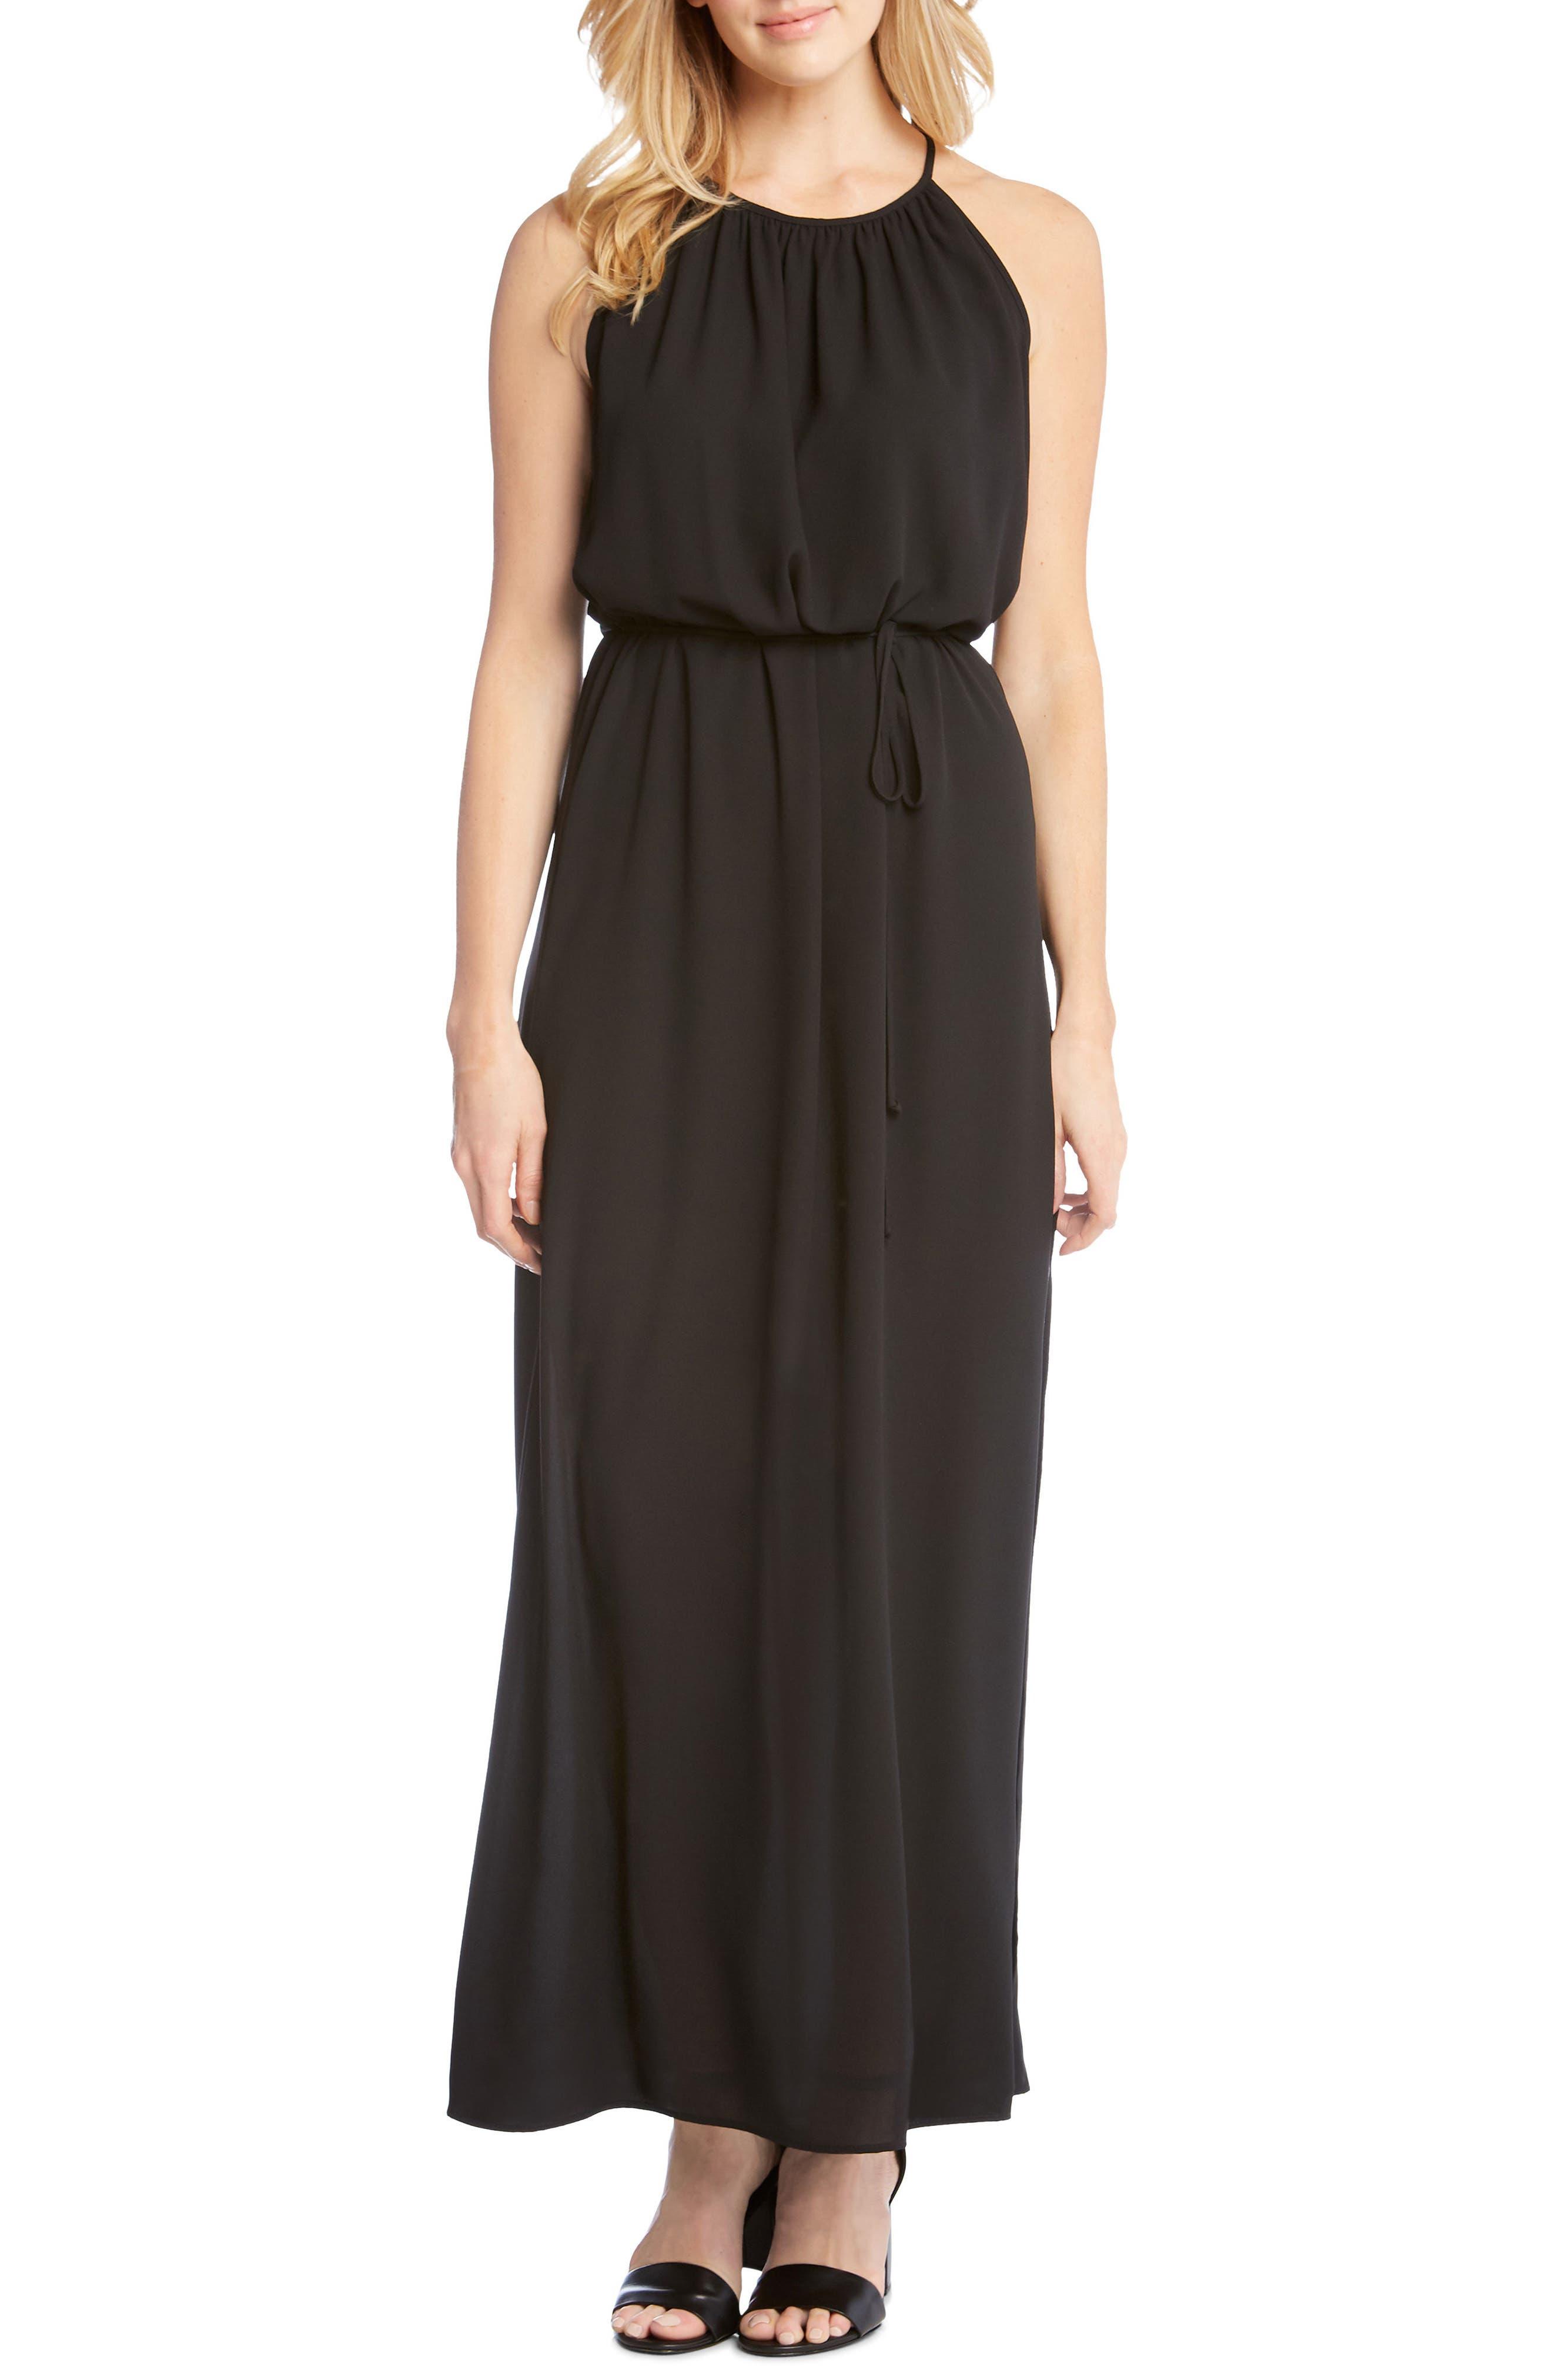 Alternate Image 1 Selected - Karen Kane Morgan Halter Maxi Dress